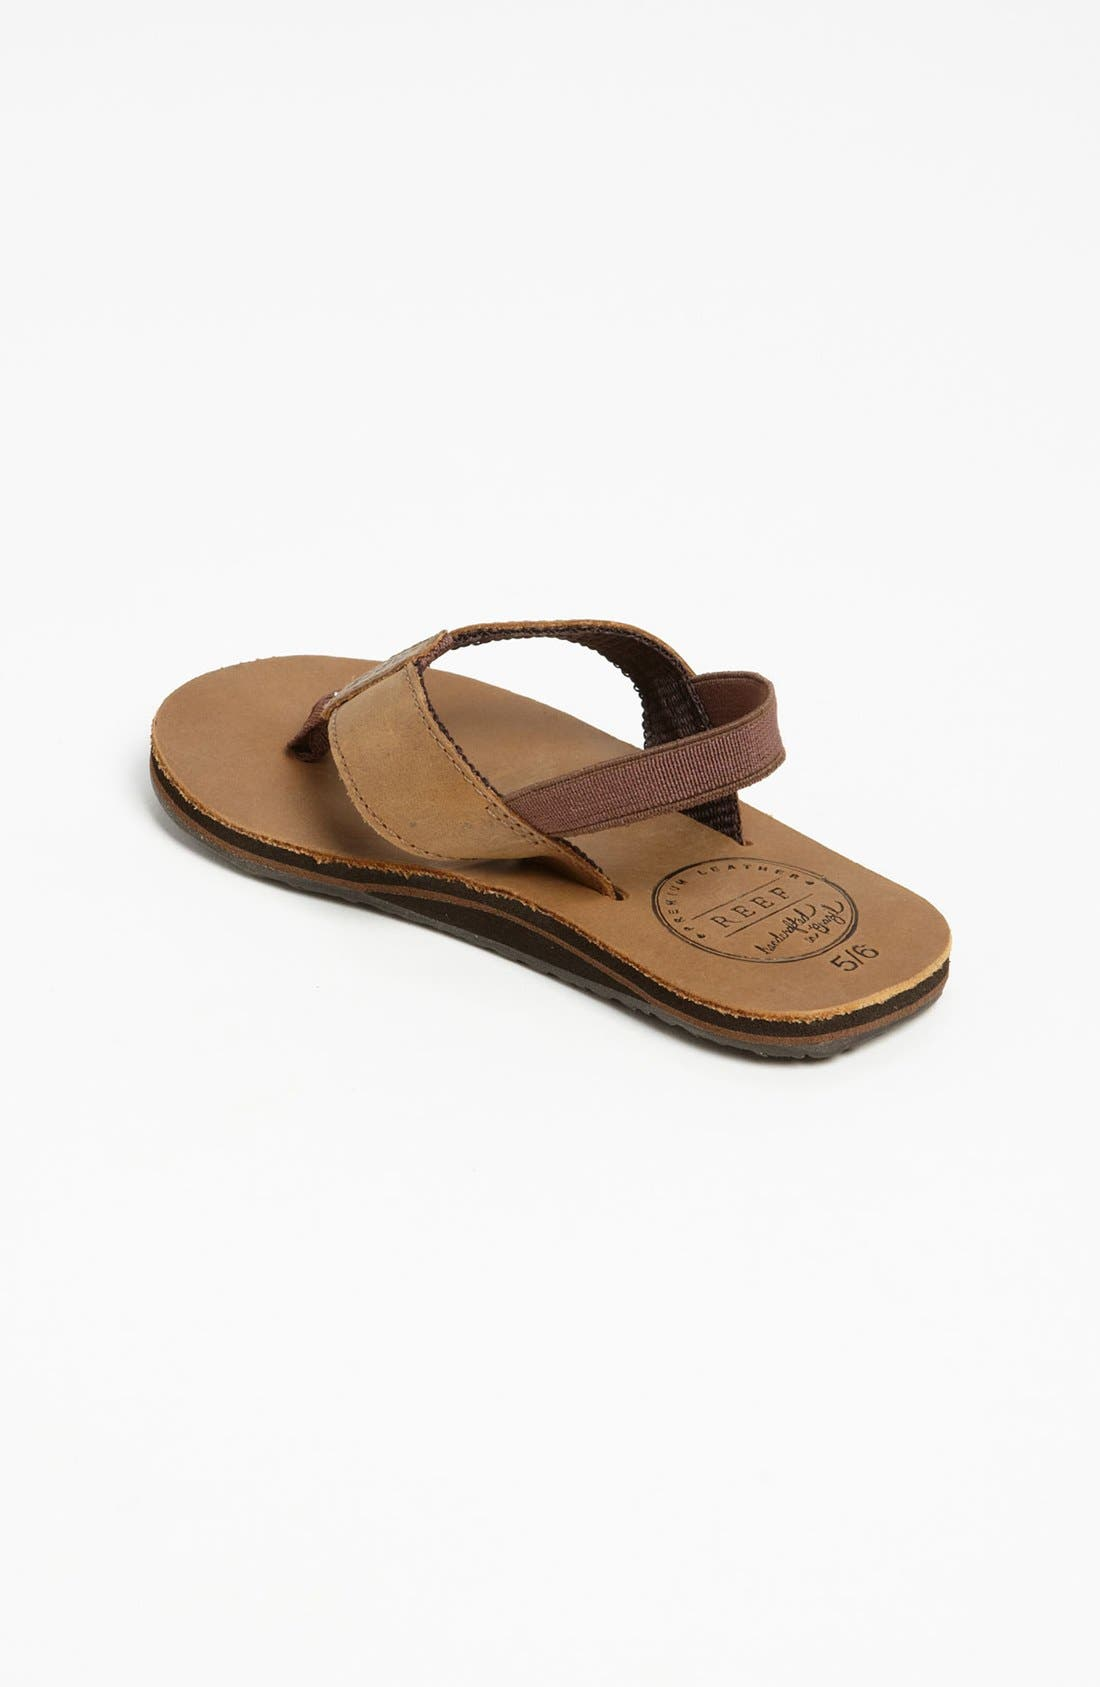 'Grom' Leather Flip-Flop,                             Alternate thumbnail 7, color,                             200